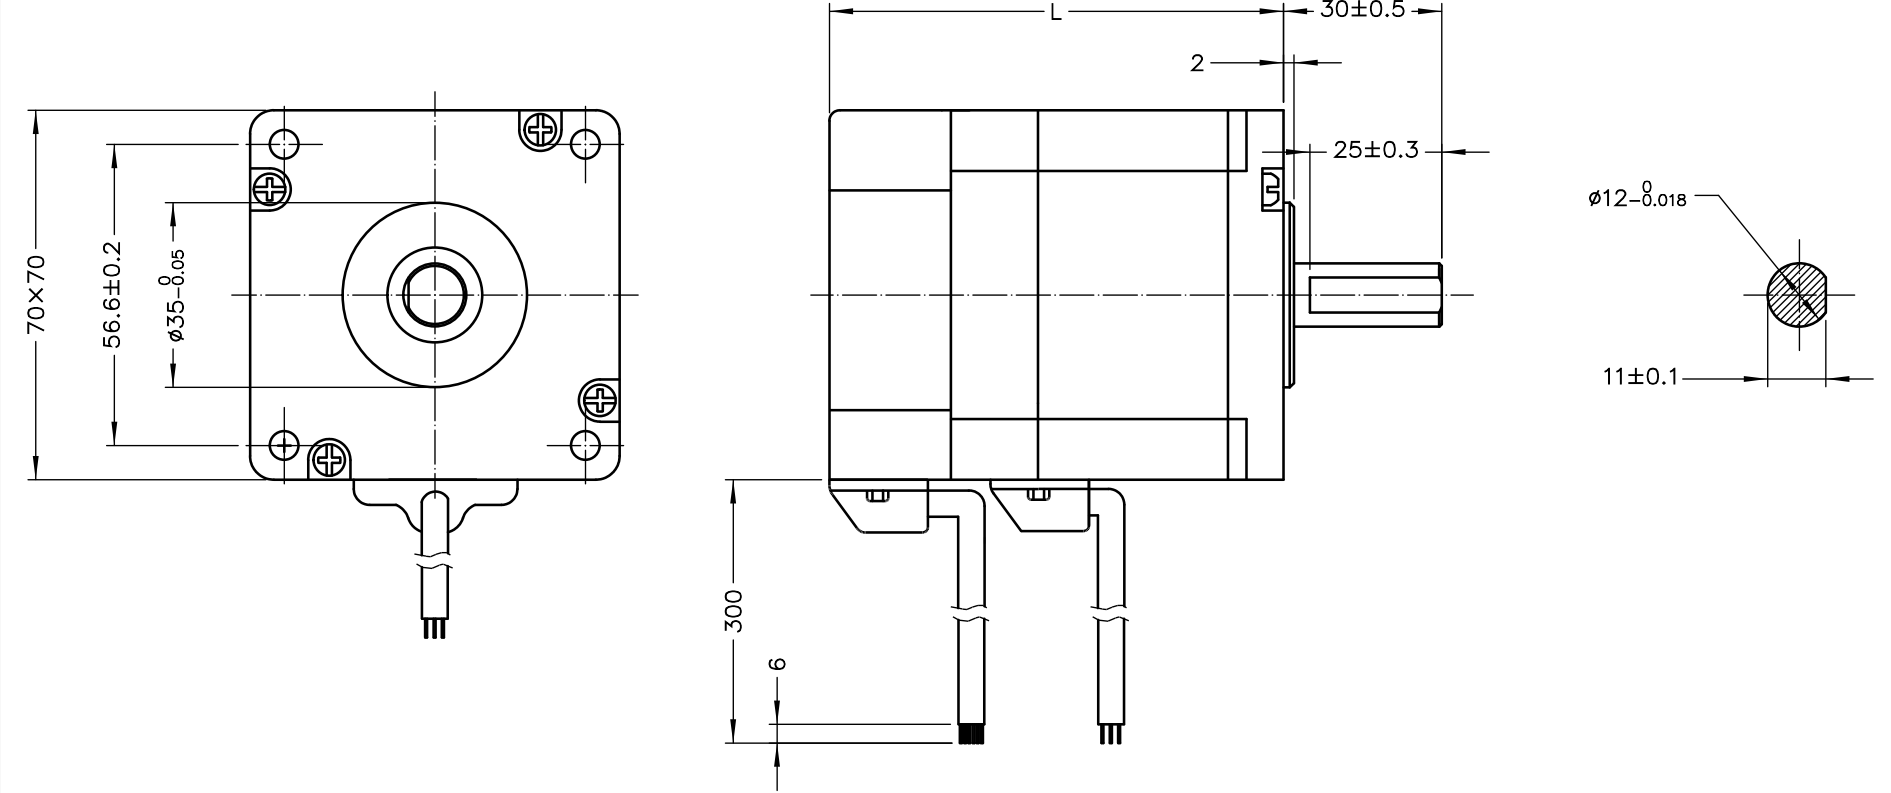 NEMA 28 BLDC Motor Drawing